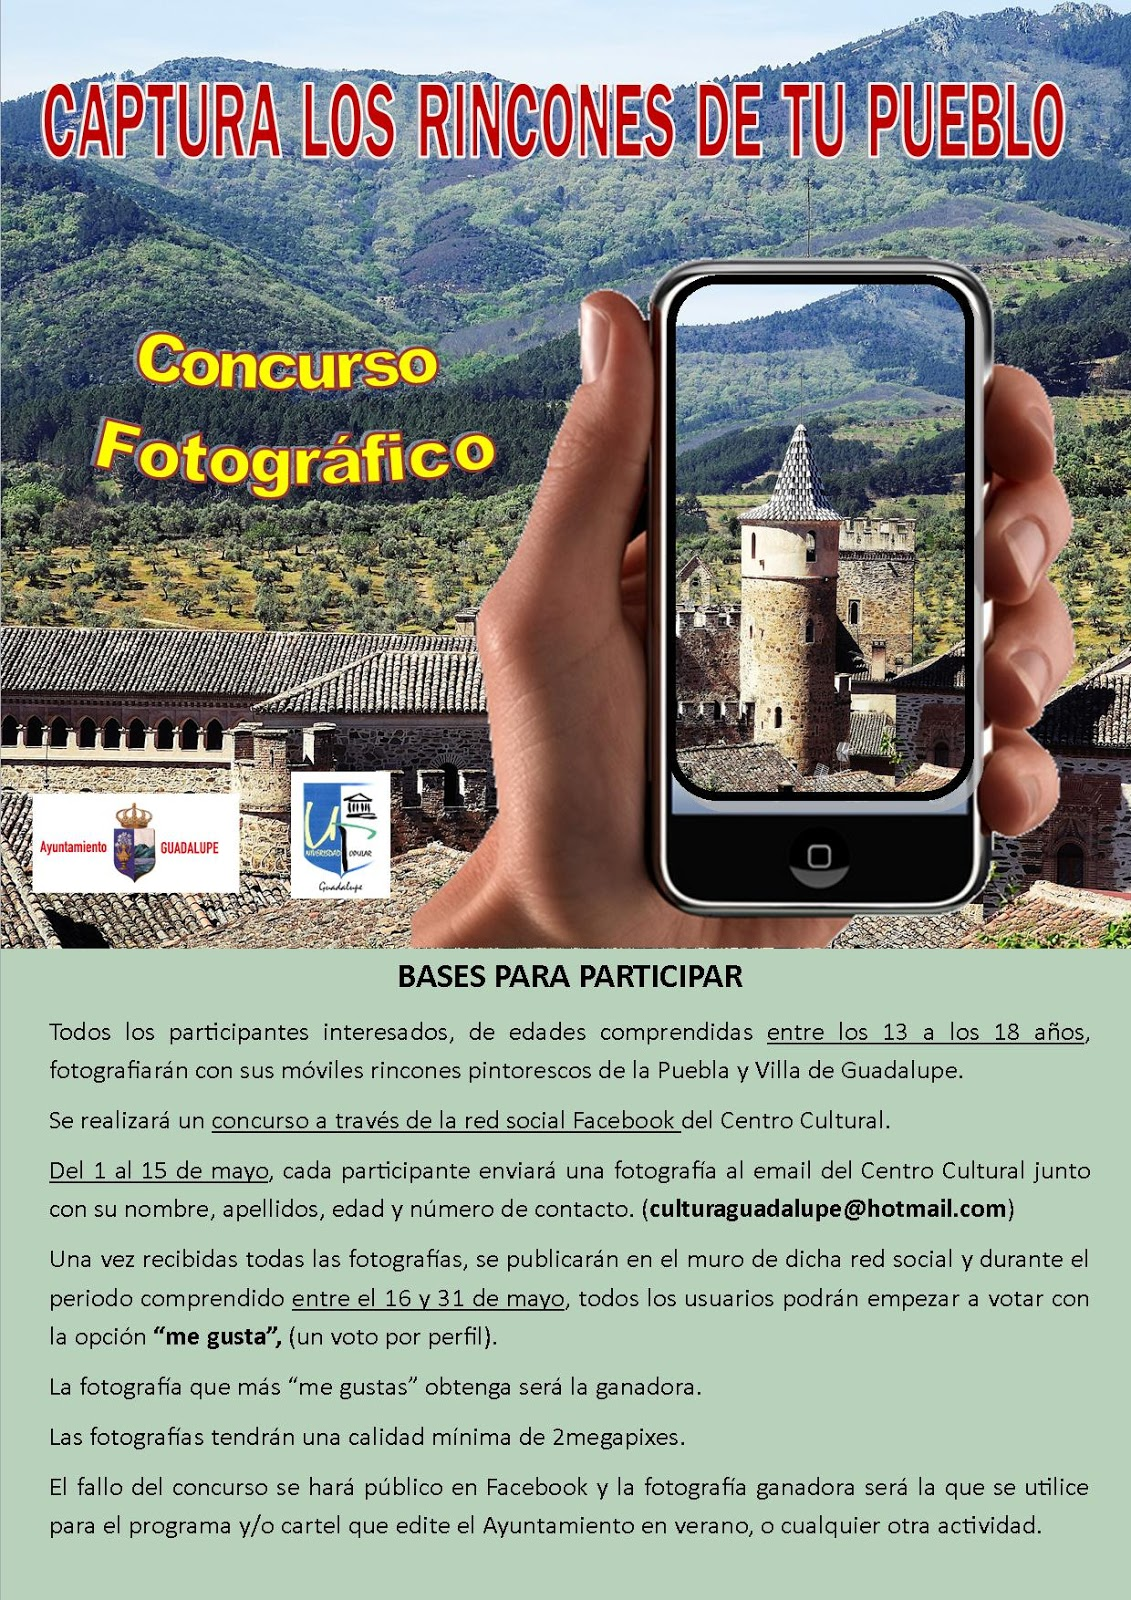 Concurso fotográfico Mayo 2017 - Guadalupe